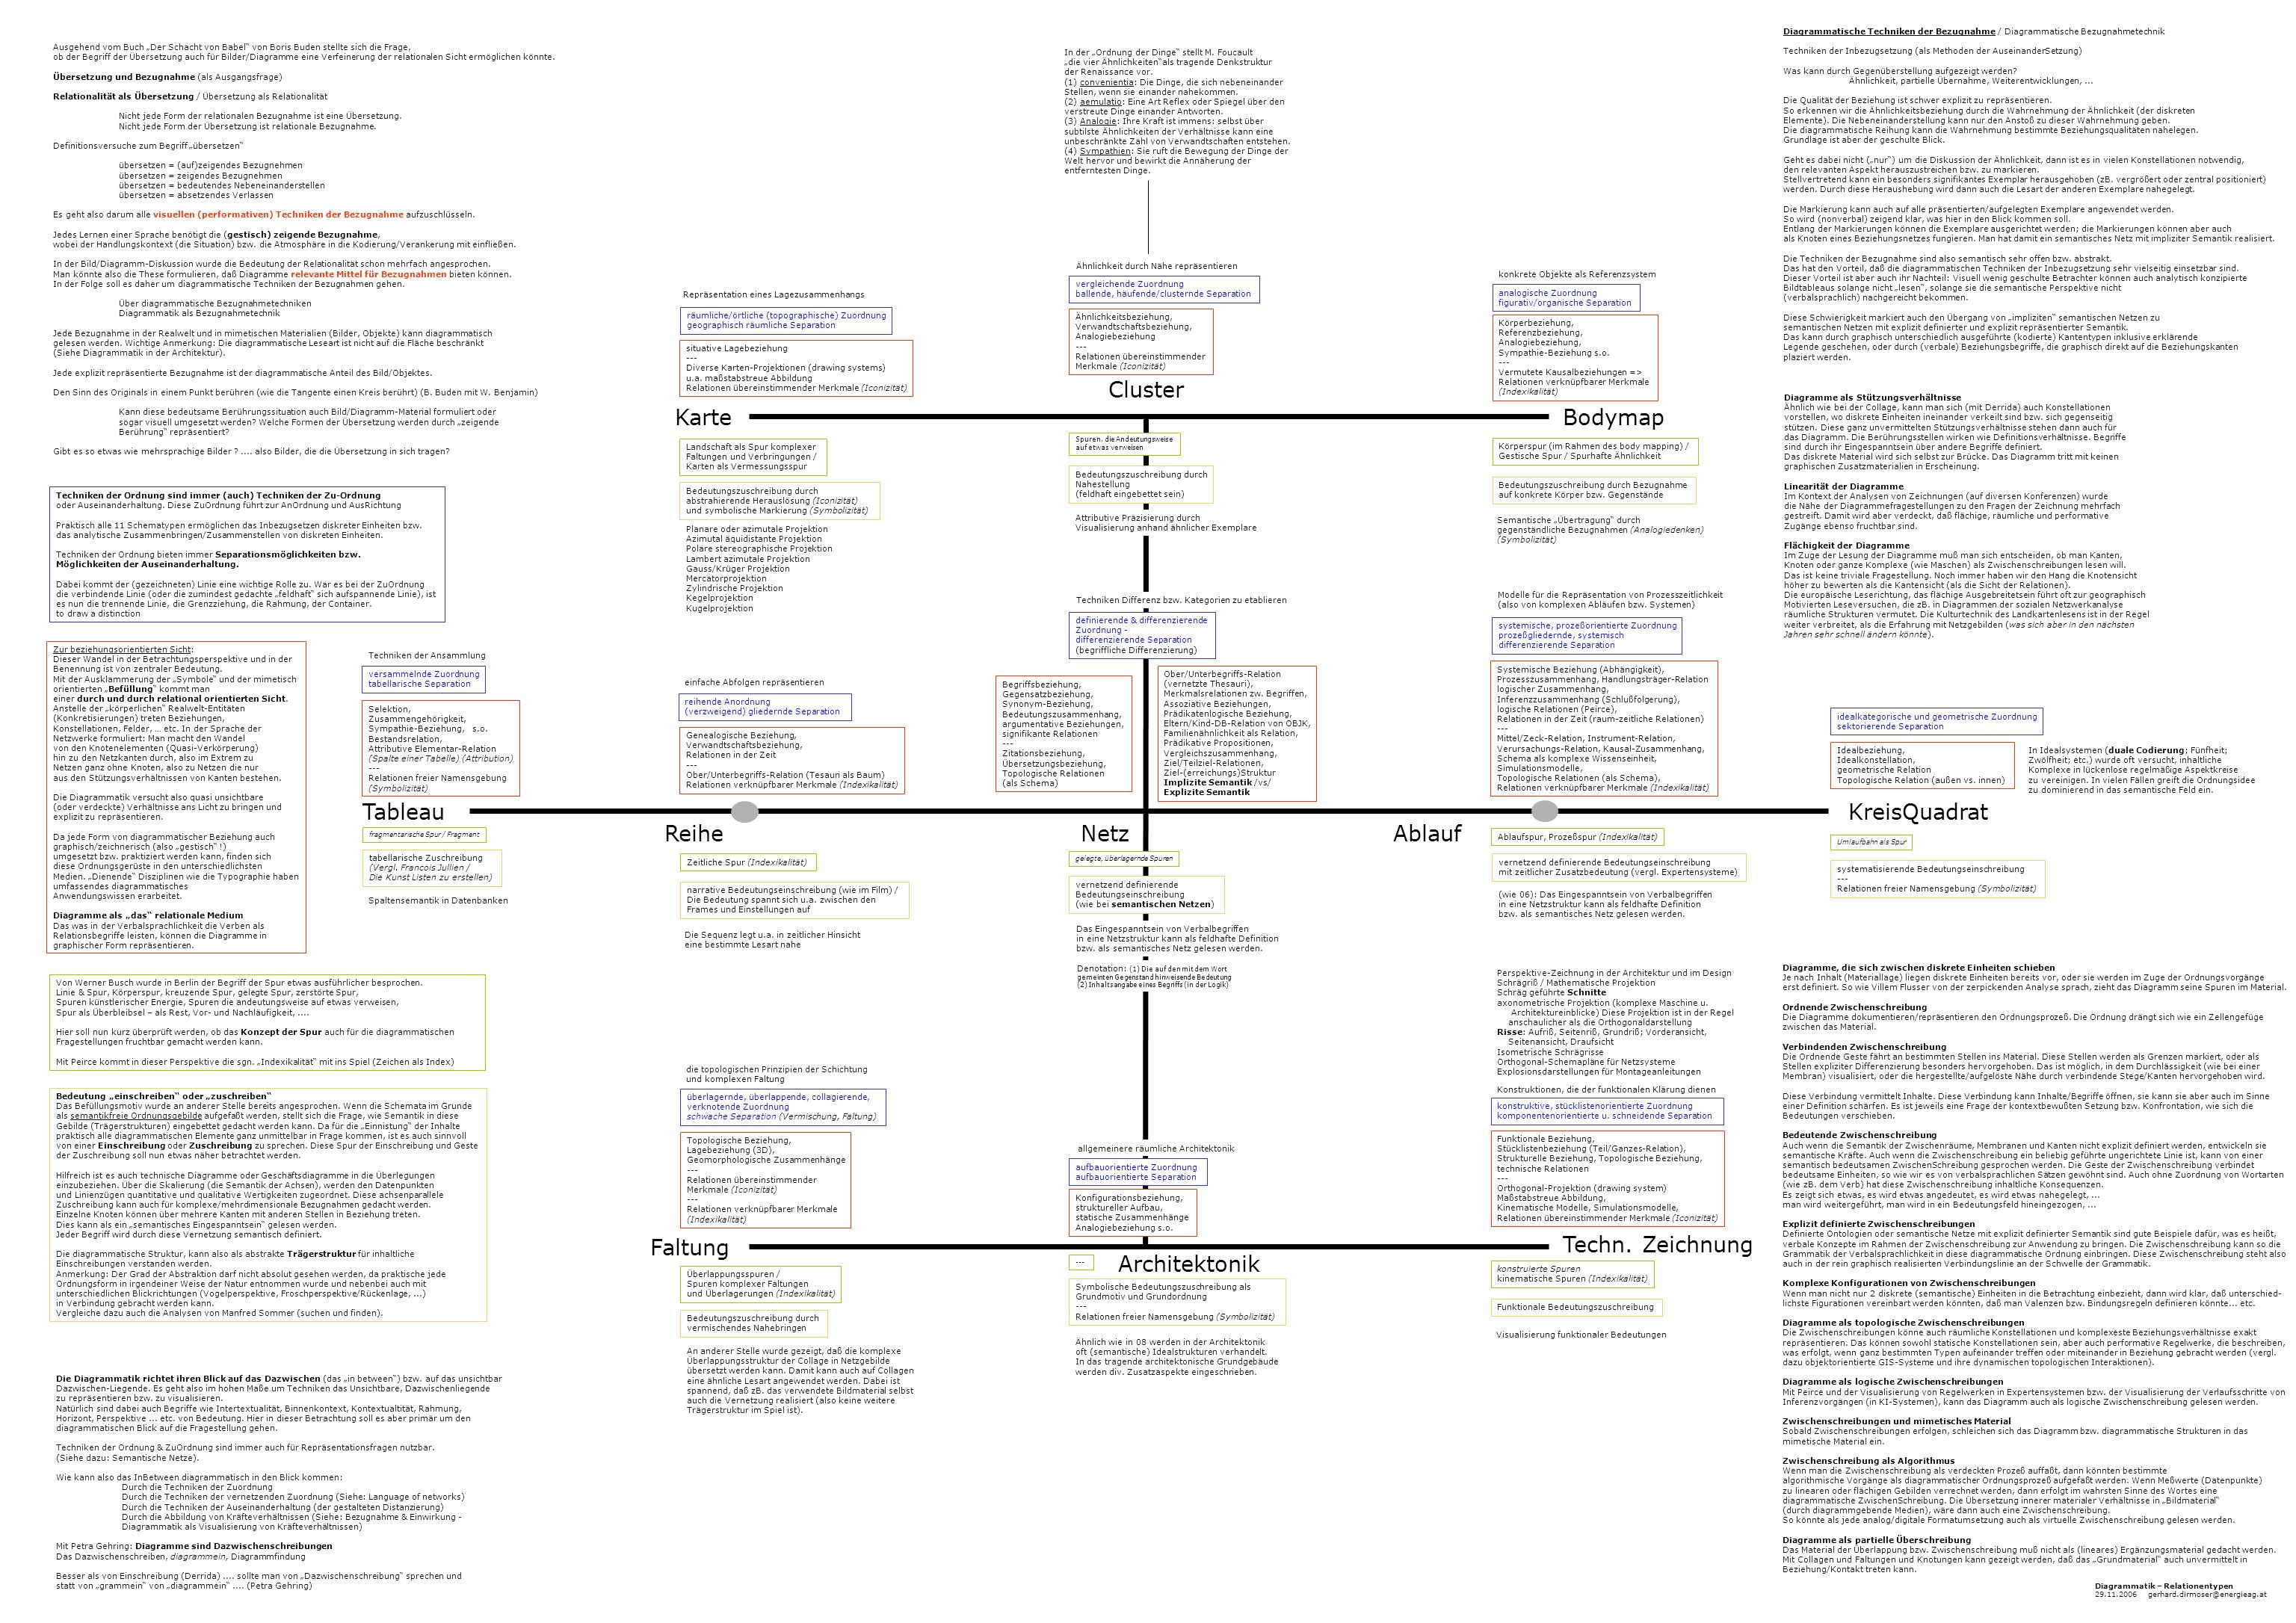 Cluster Karte Bodymap Tableau KreisQuadrat Reihe Netz Ablauf Faltung